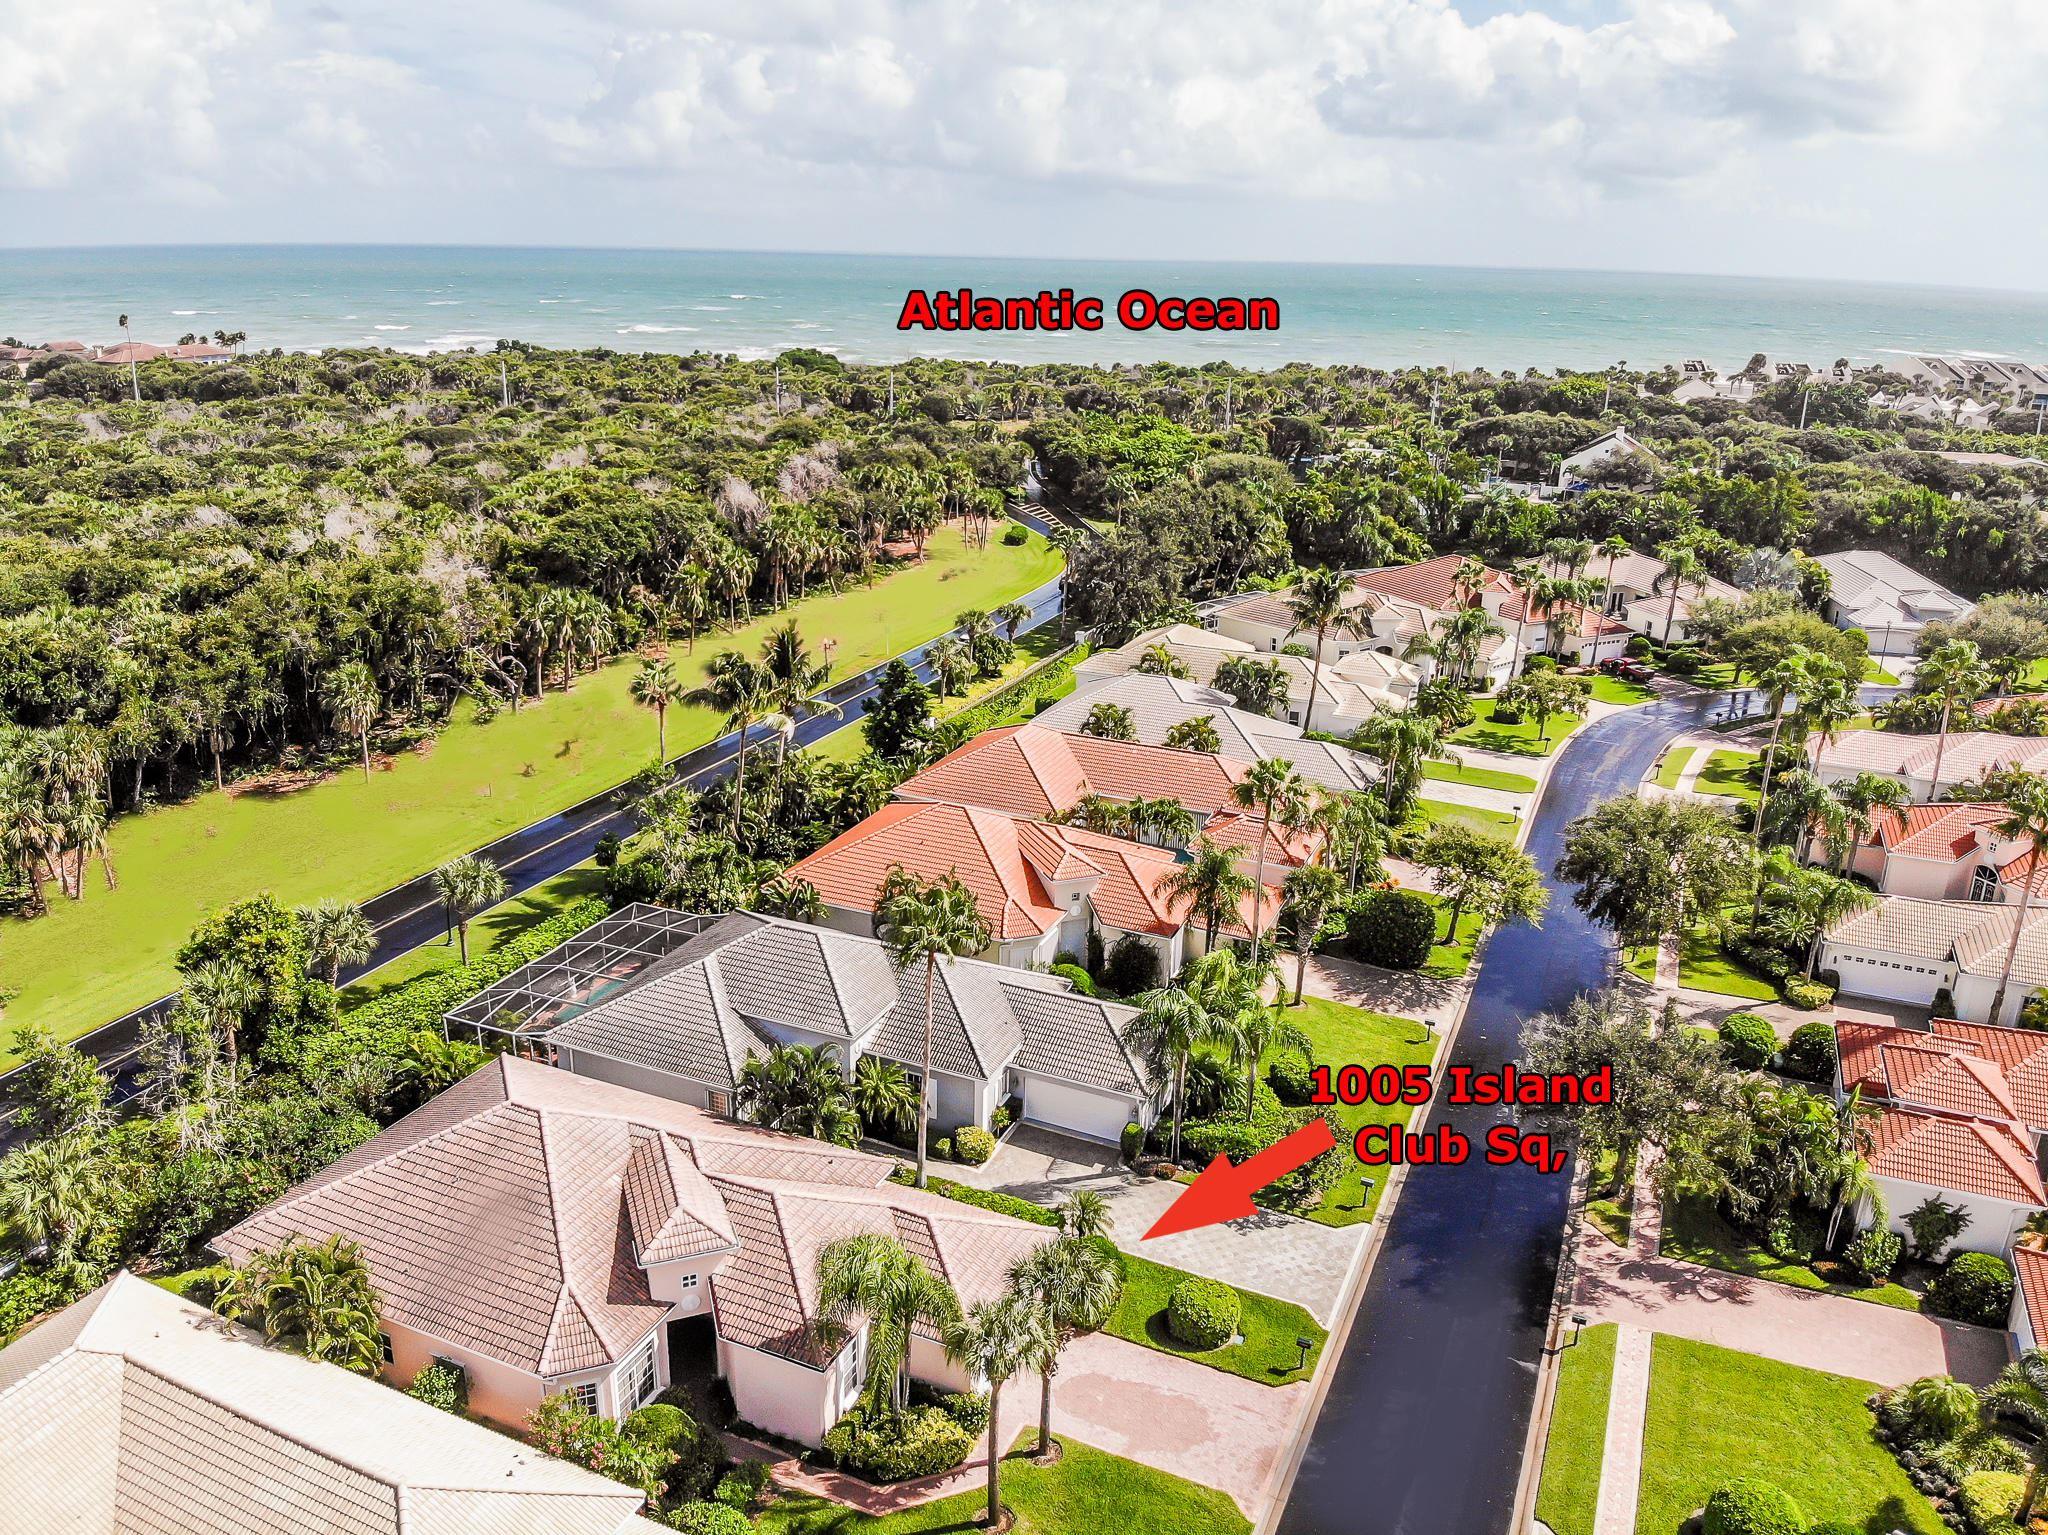 1005 Island Club Square Vero Beach, FL 32963